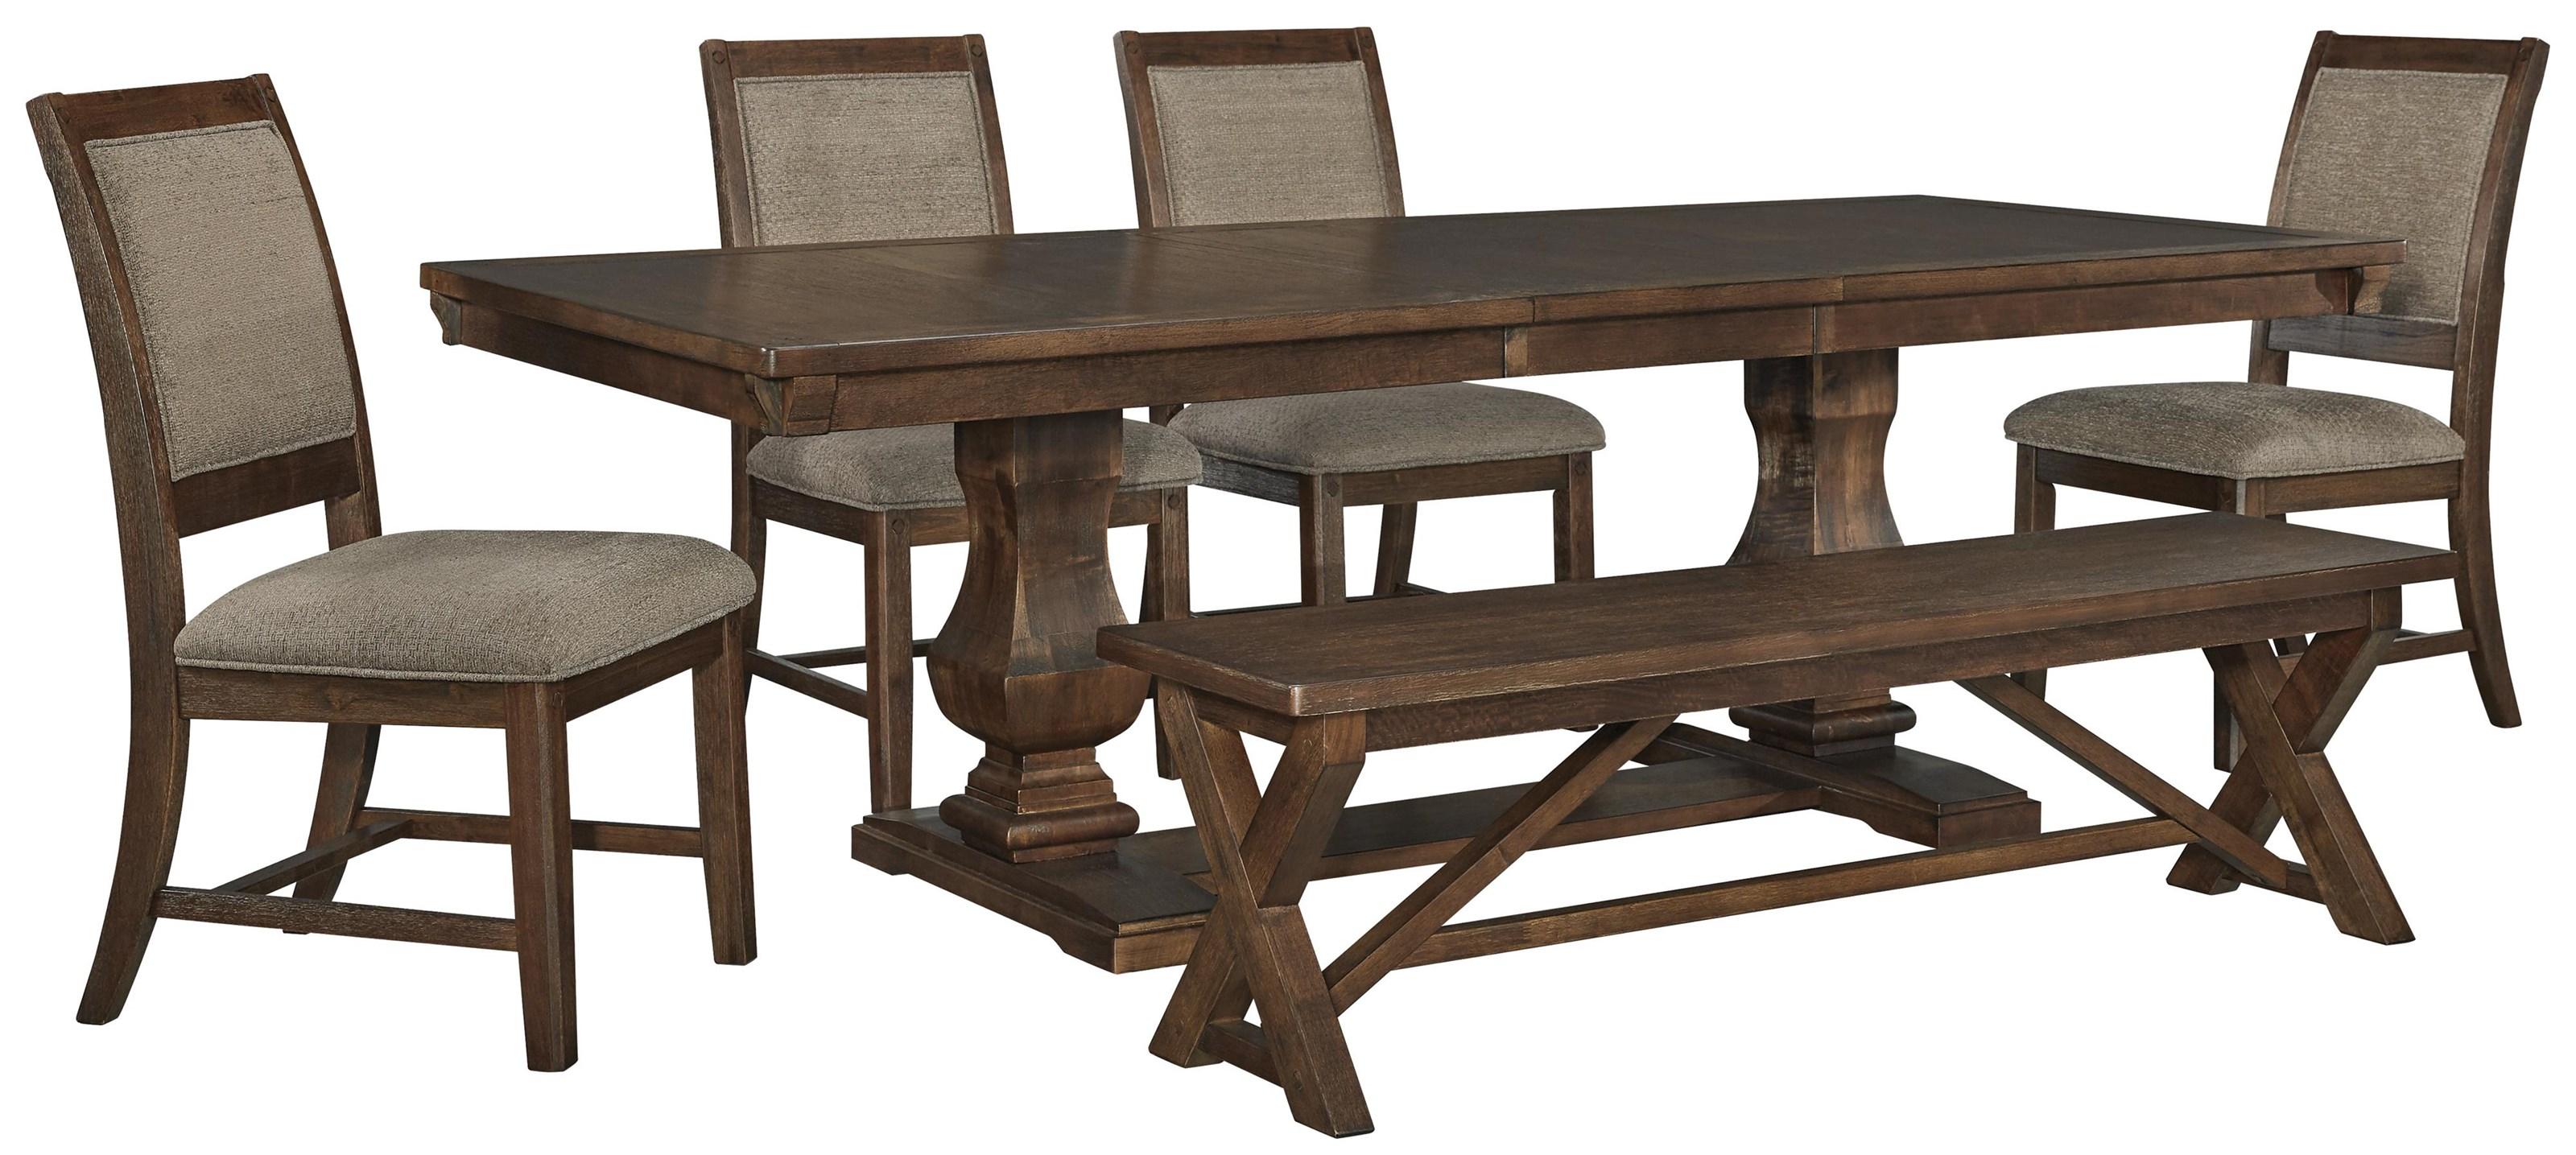 Windville 6 PC Dining Room Set by Millennium at Sam Levitz Furniture